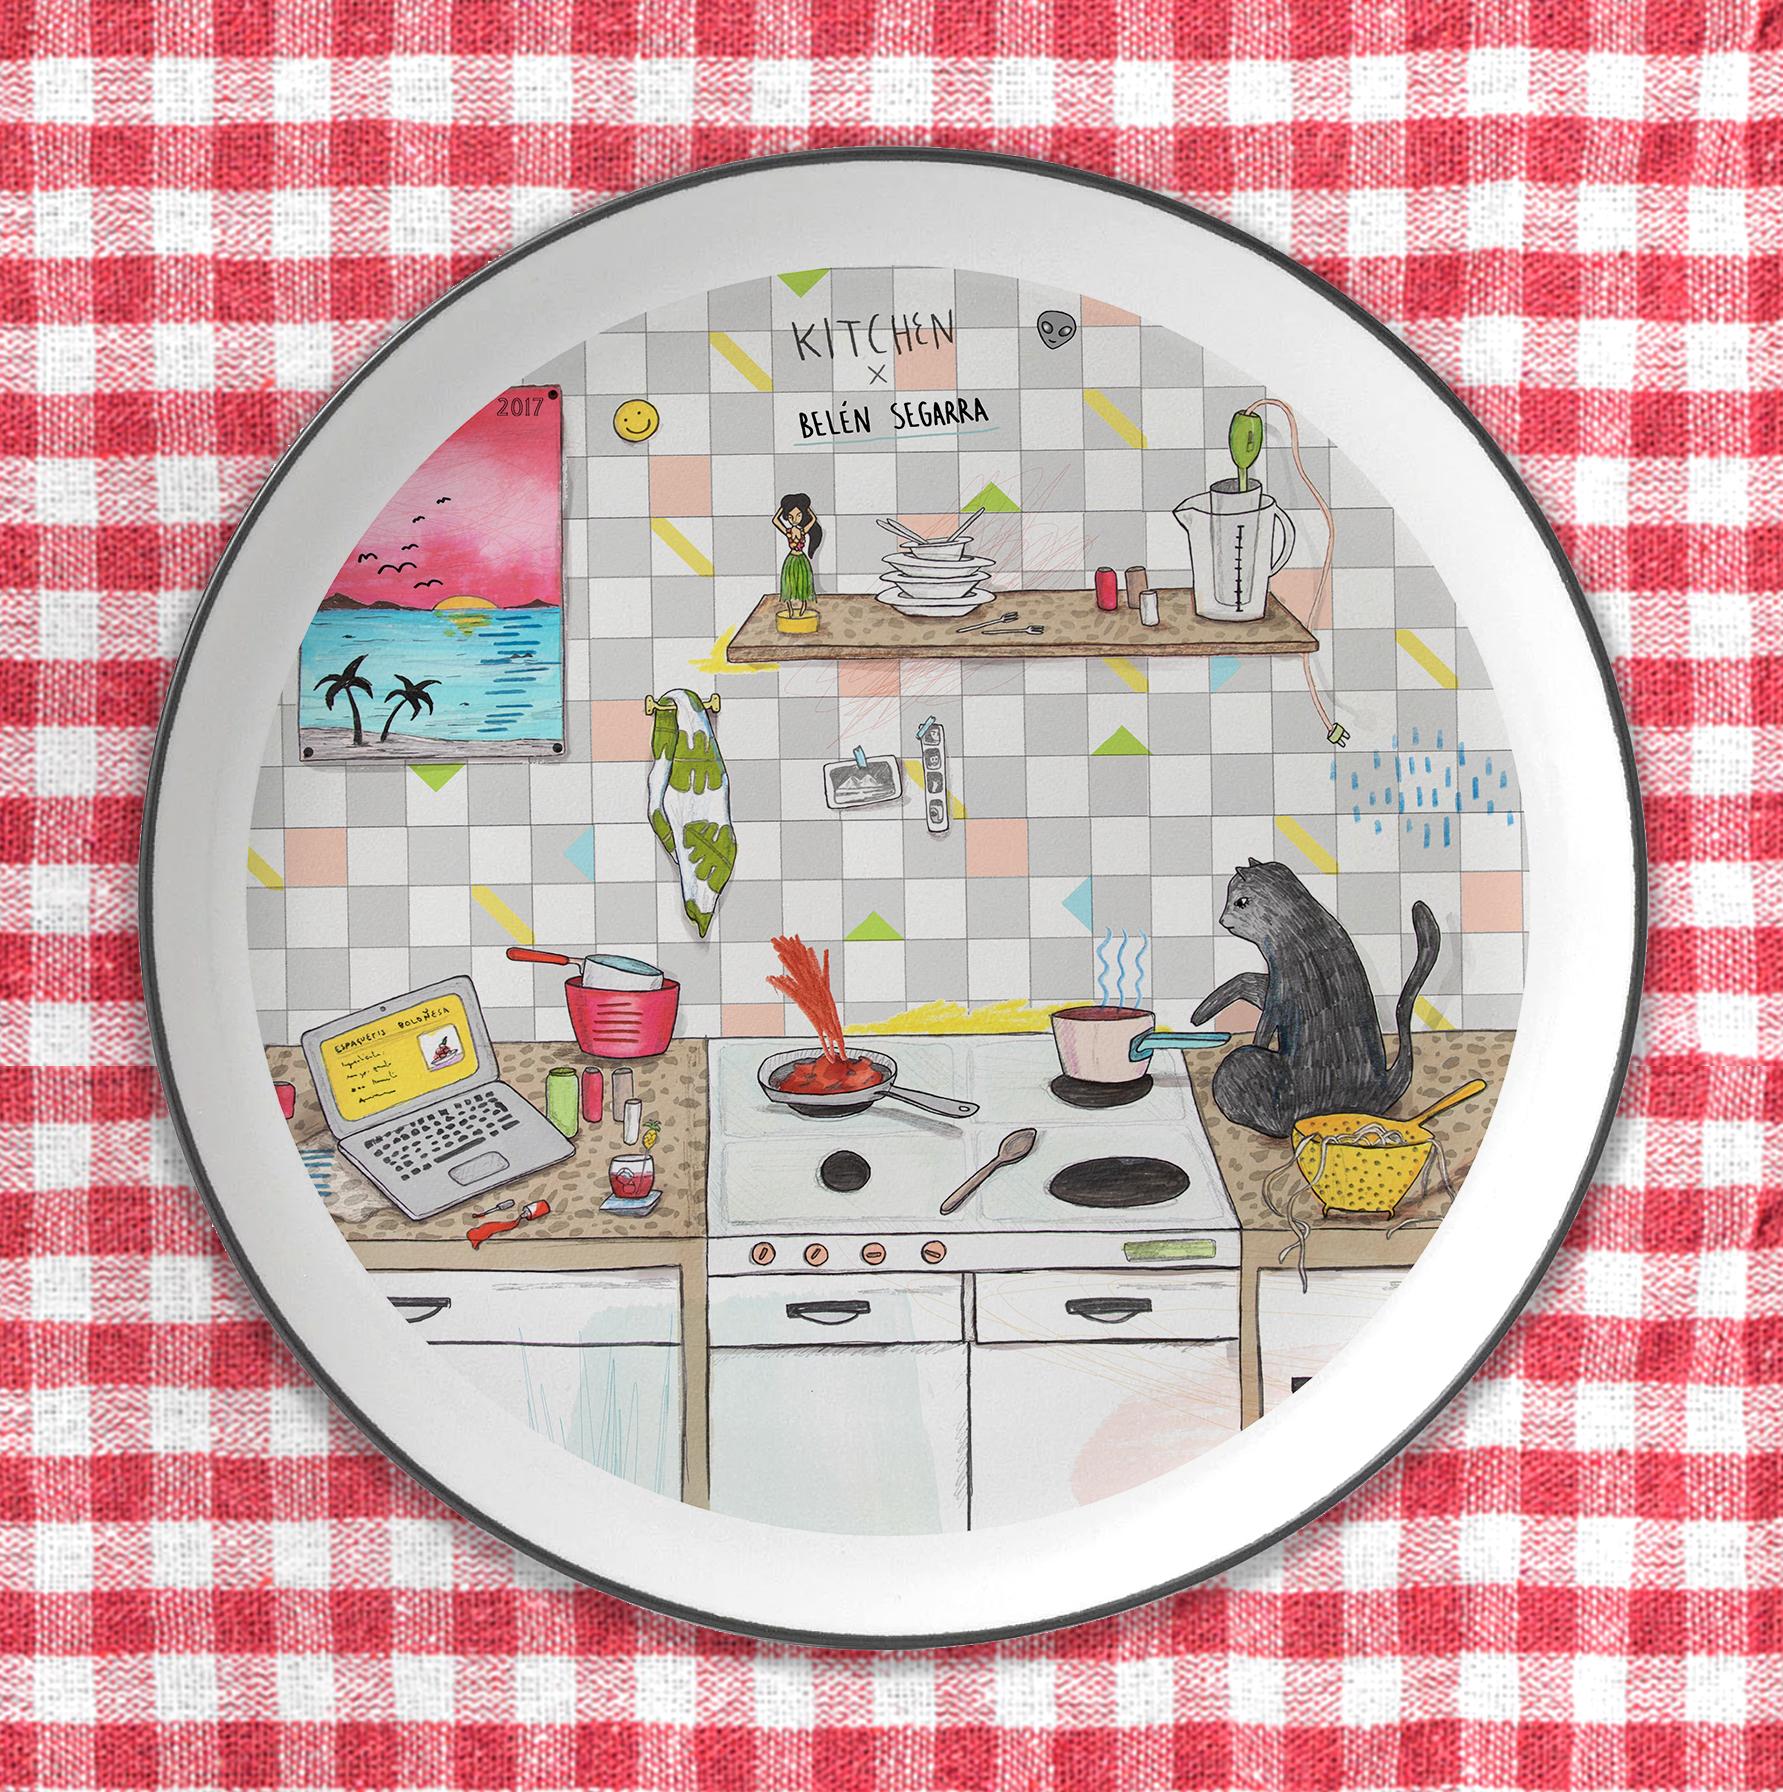 kitchen plato_belen segarra_ cocina